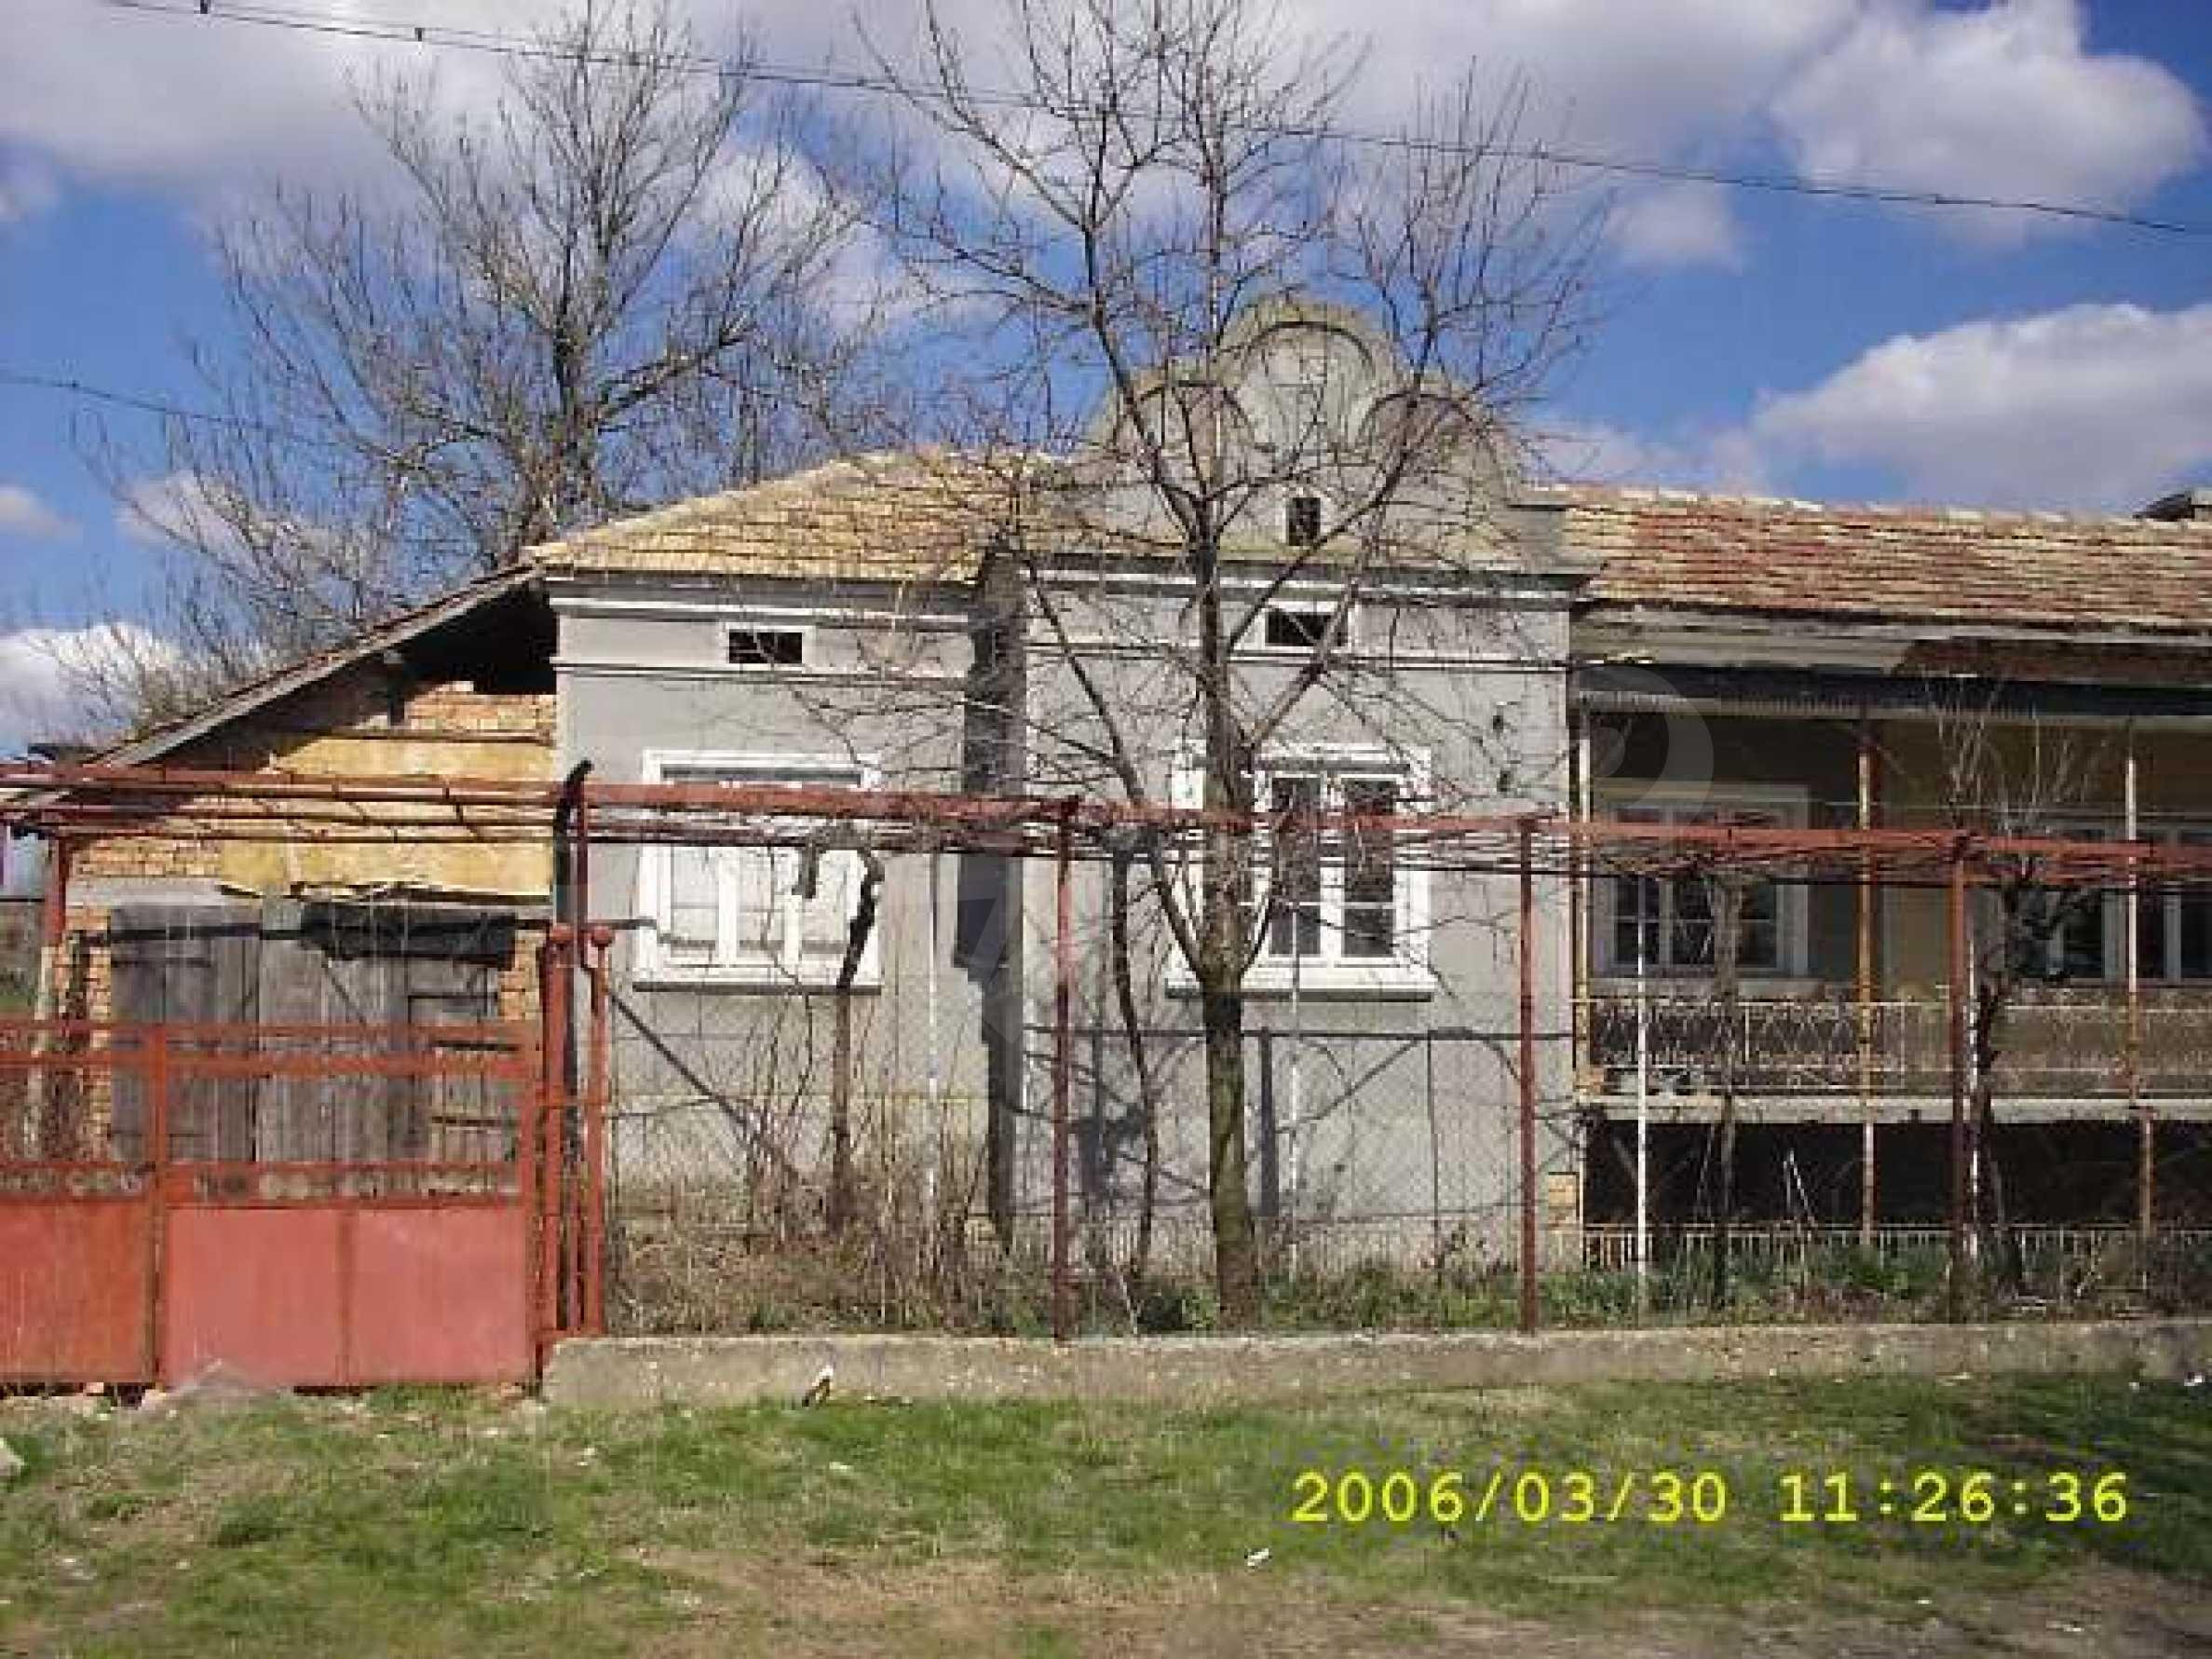 Karapelit Haus 2